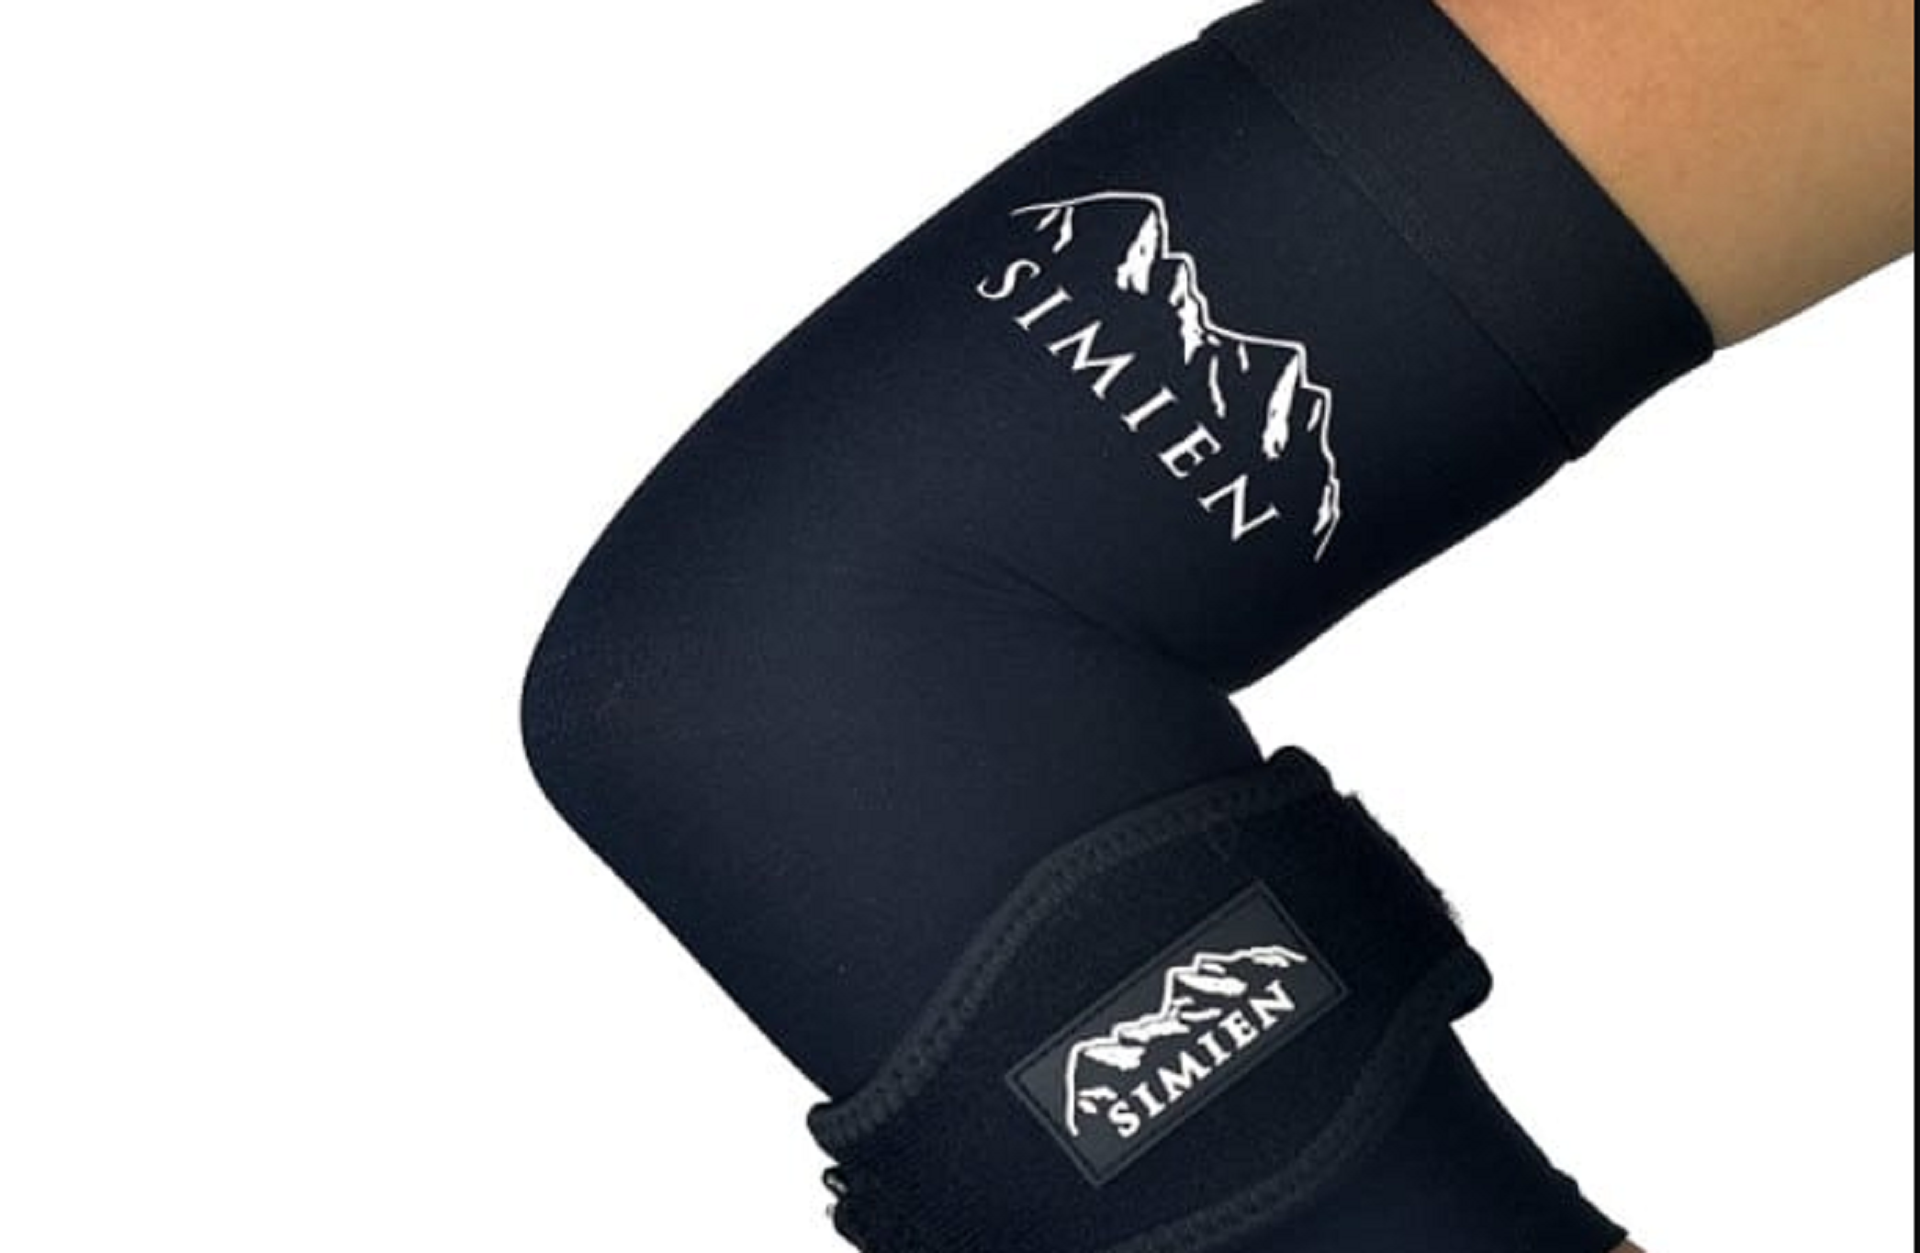 simien tennis elbow brace